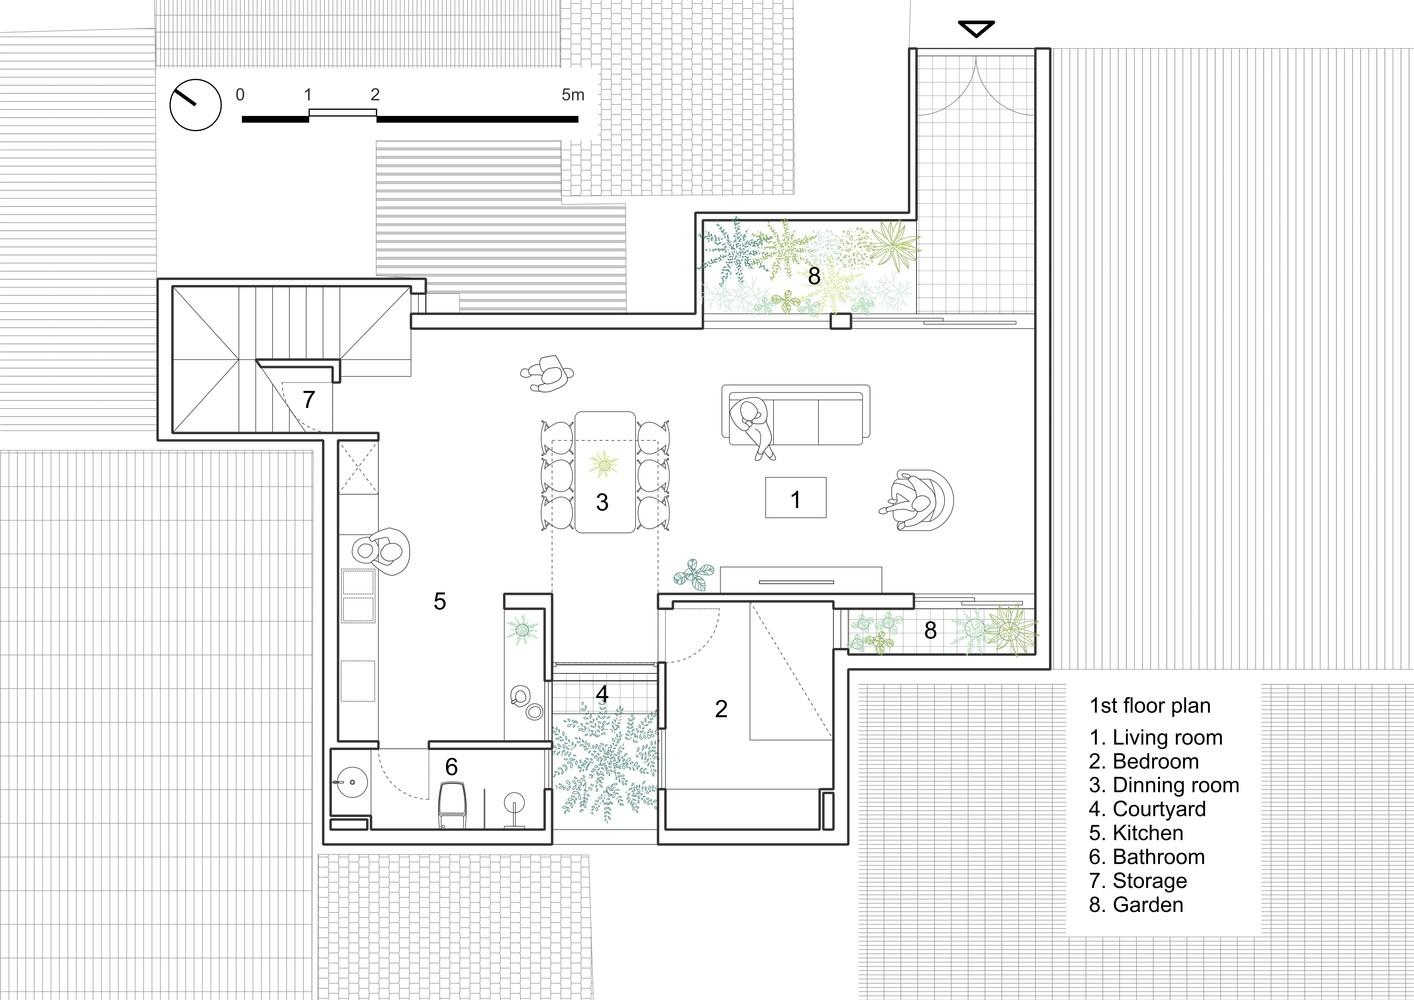 Thiết kế tầng 1.